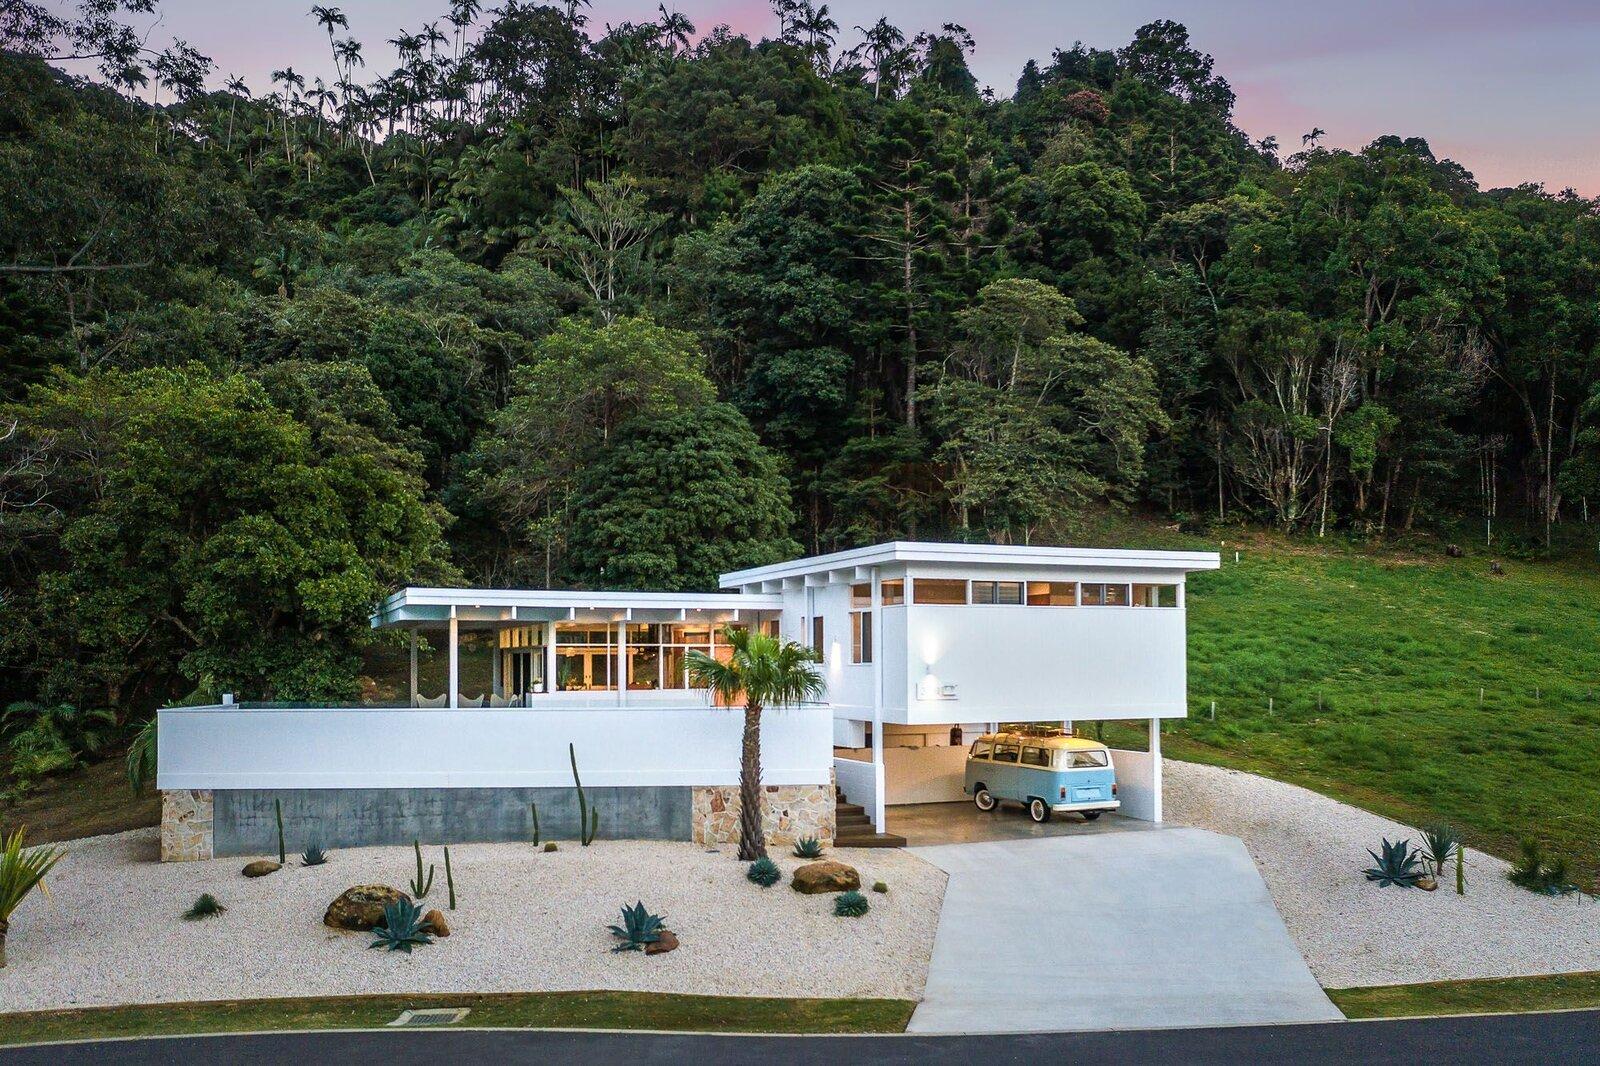 An Australian Family's Dream Home Celebrates Mies van der Rohe Down Under